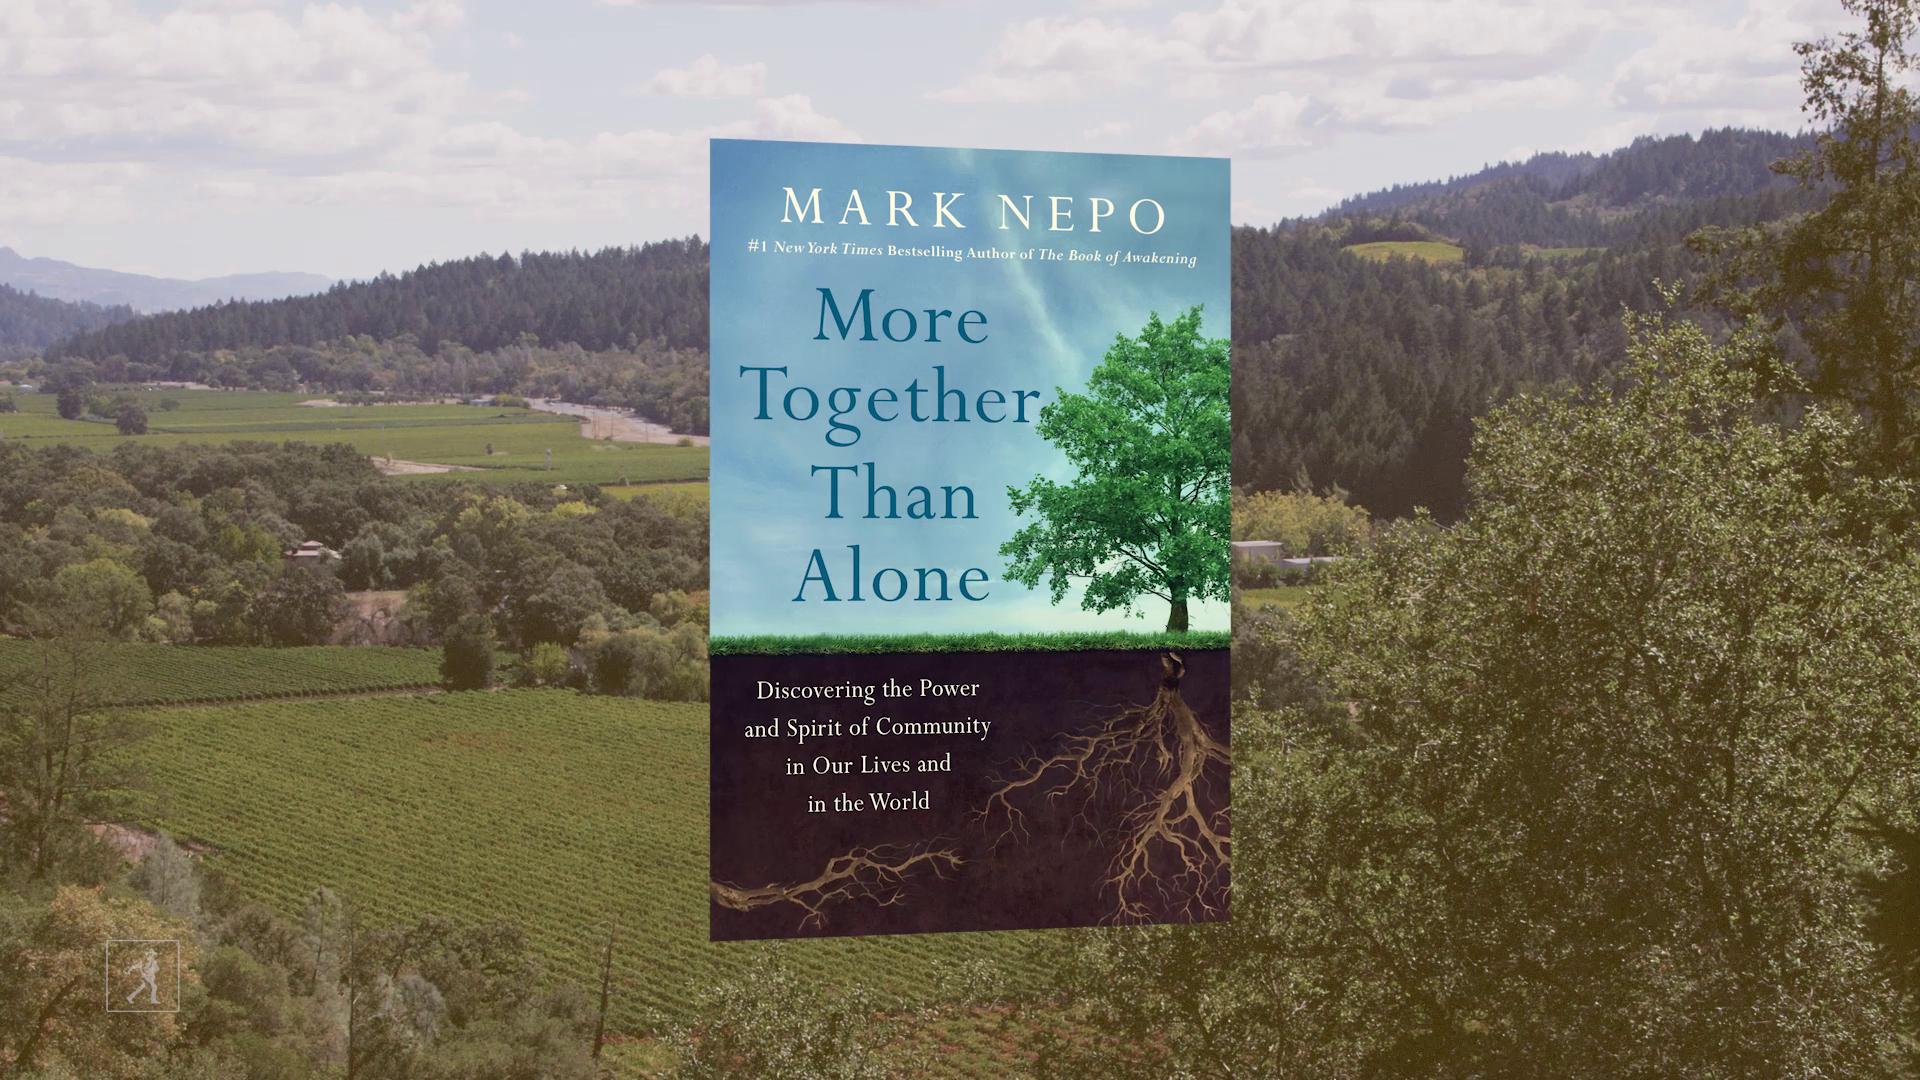 Mark Nepo Explores The Power Of Community